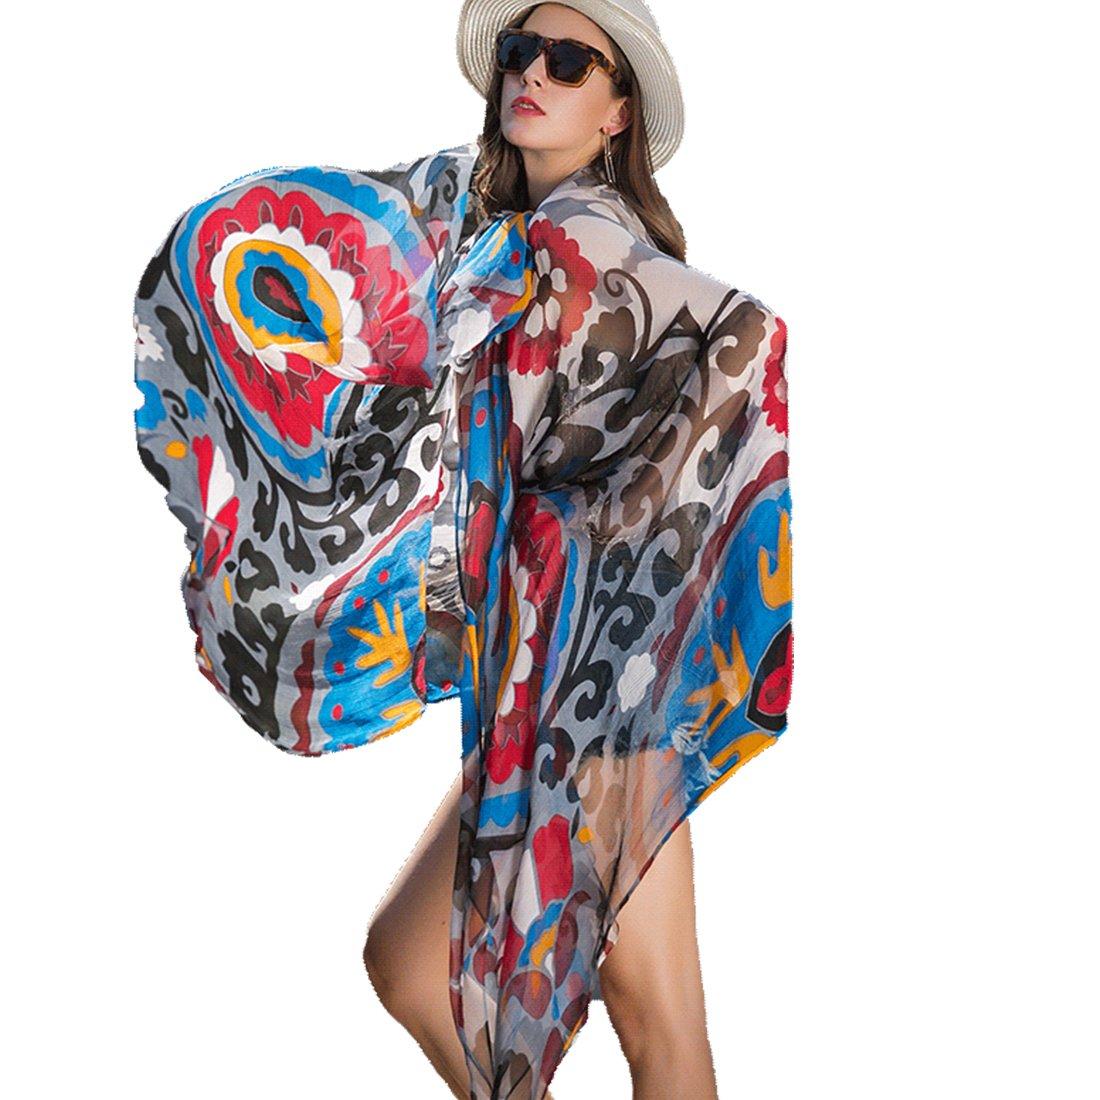 bluee DANA XU 100% Pure Silk Large Size Pashmina Shawls and Wraps Women Scarf